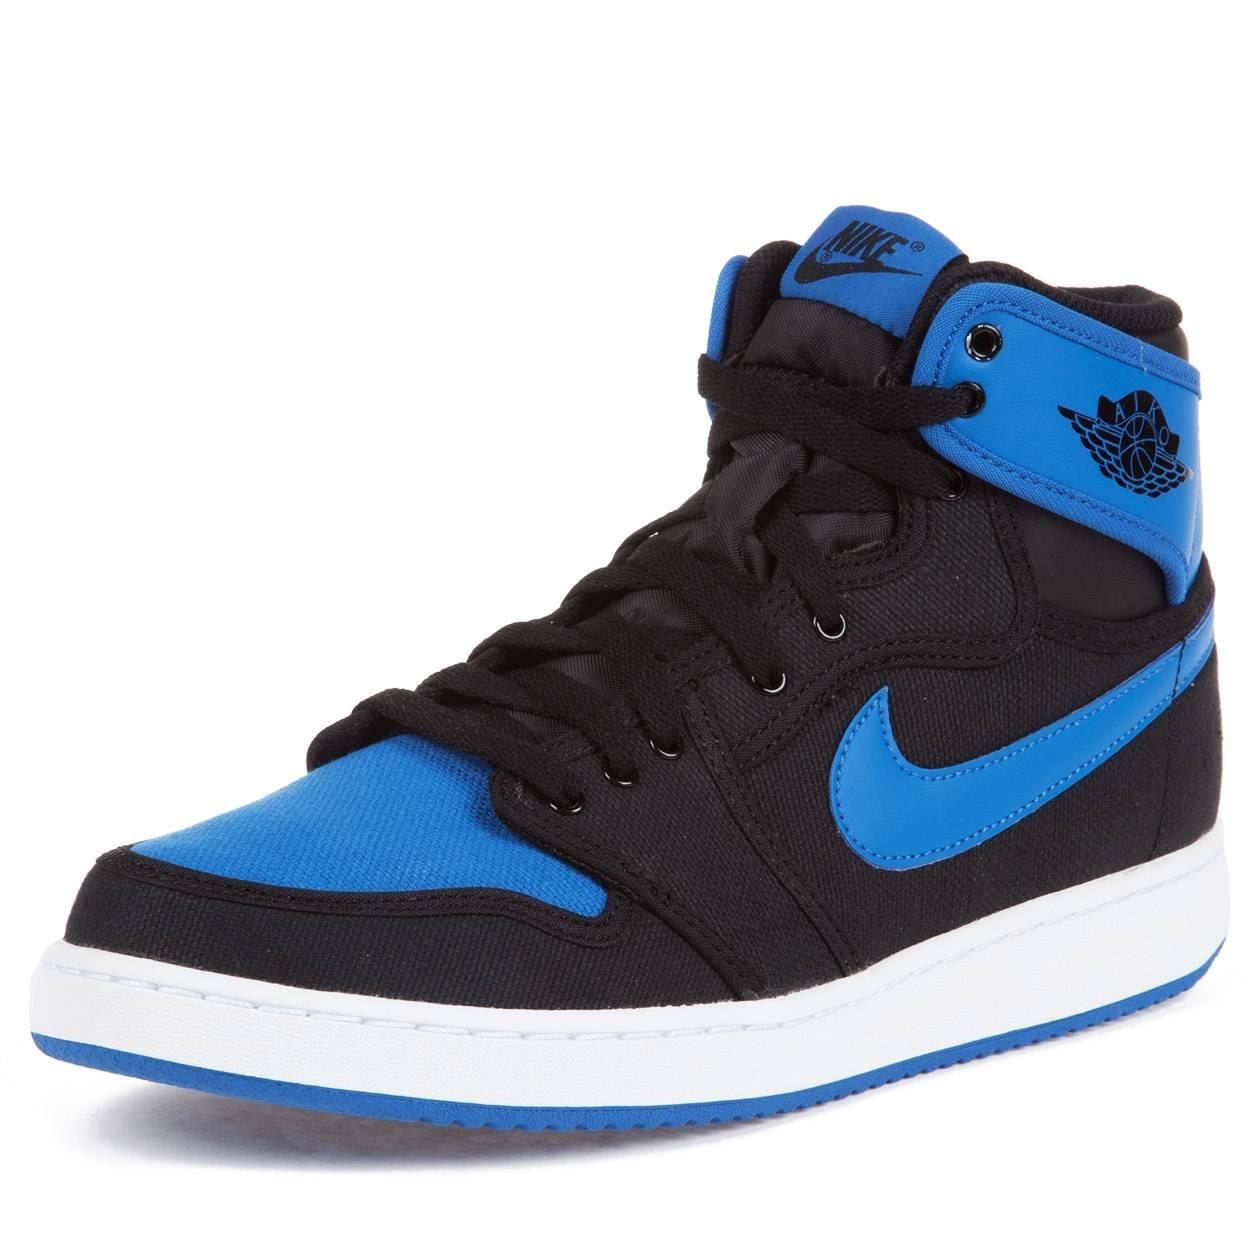 40a940131573c1 Galleon - Nike Air Jordan 1 KO High OG Mens Basketball Shoes 638471-007  Black Black-Sport Blue 11 M US